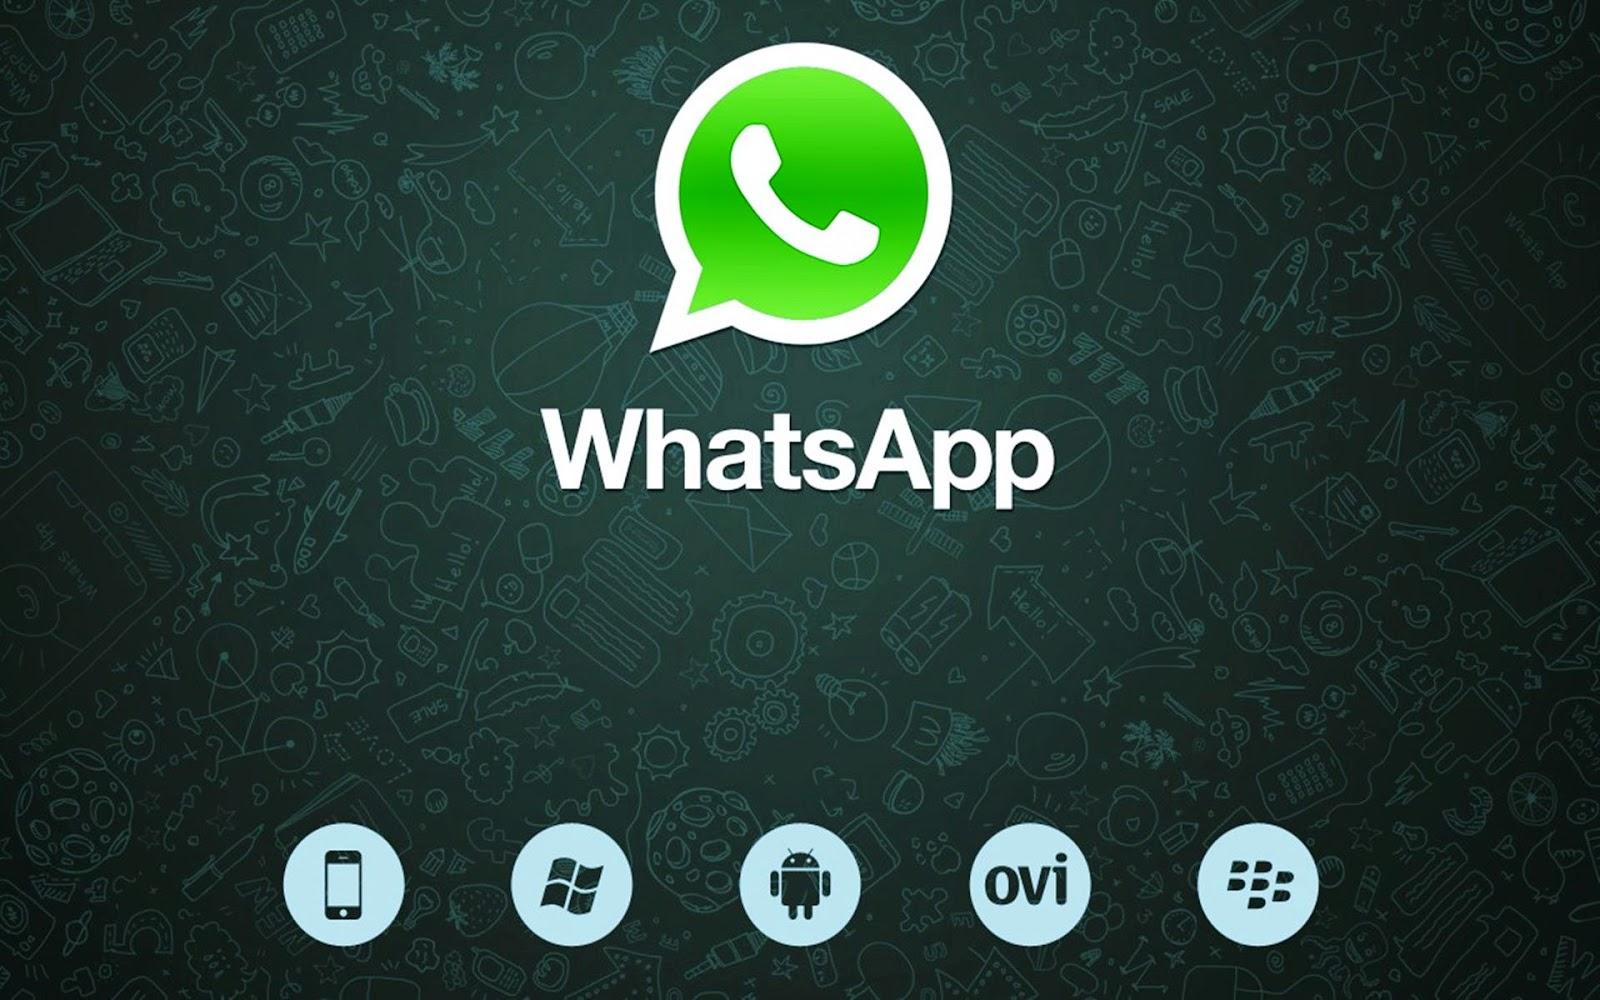 TIPS] Cara Install 2 Aplikasi WhatsApp Pada 1 Perangkat Android!